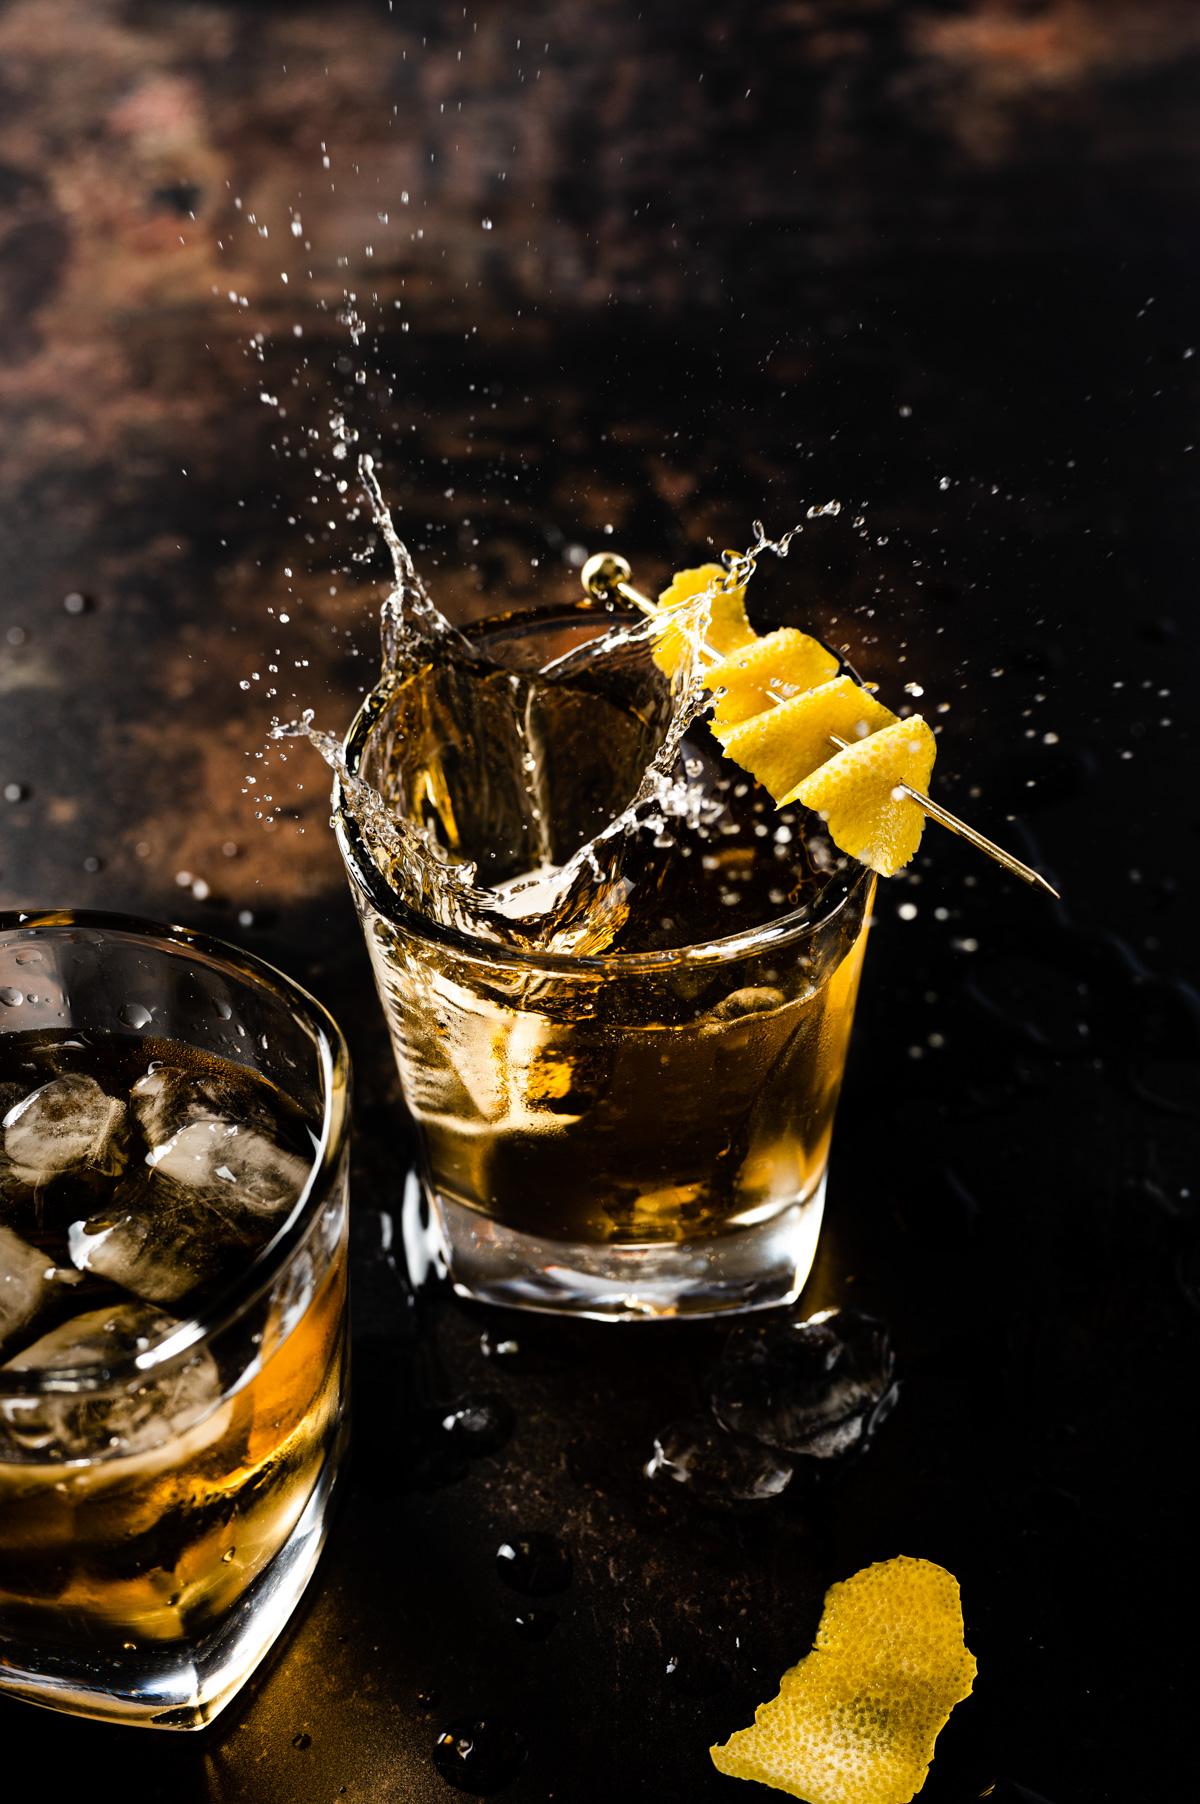 Whisky Glass with a lemon garnish on dark background with a splash